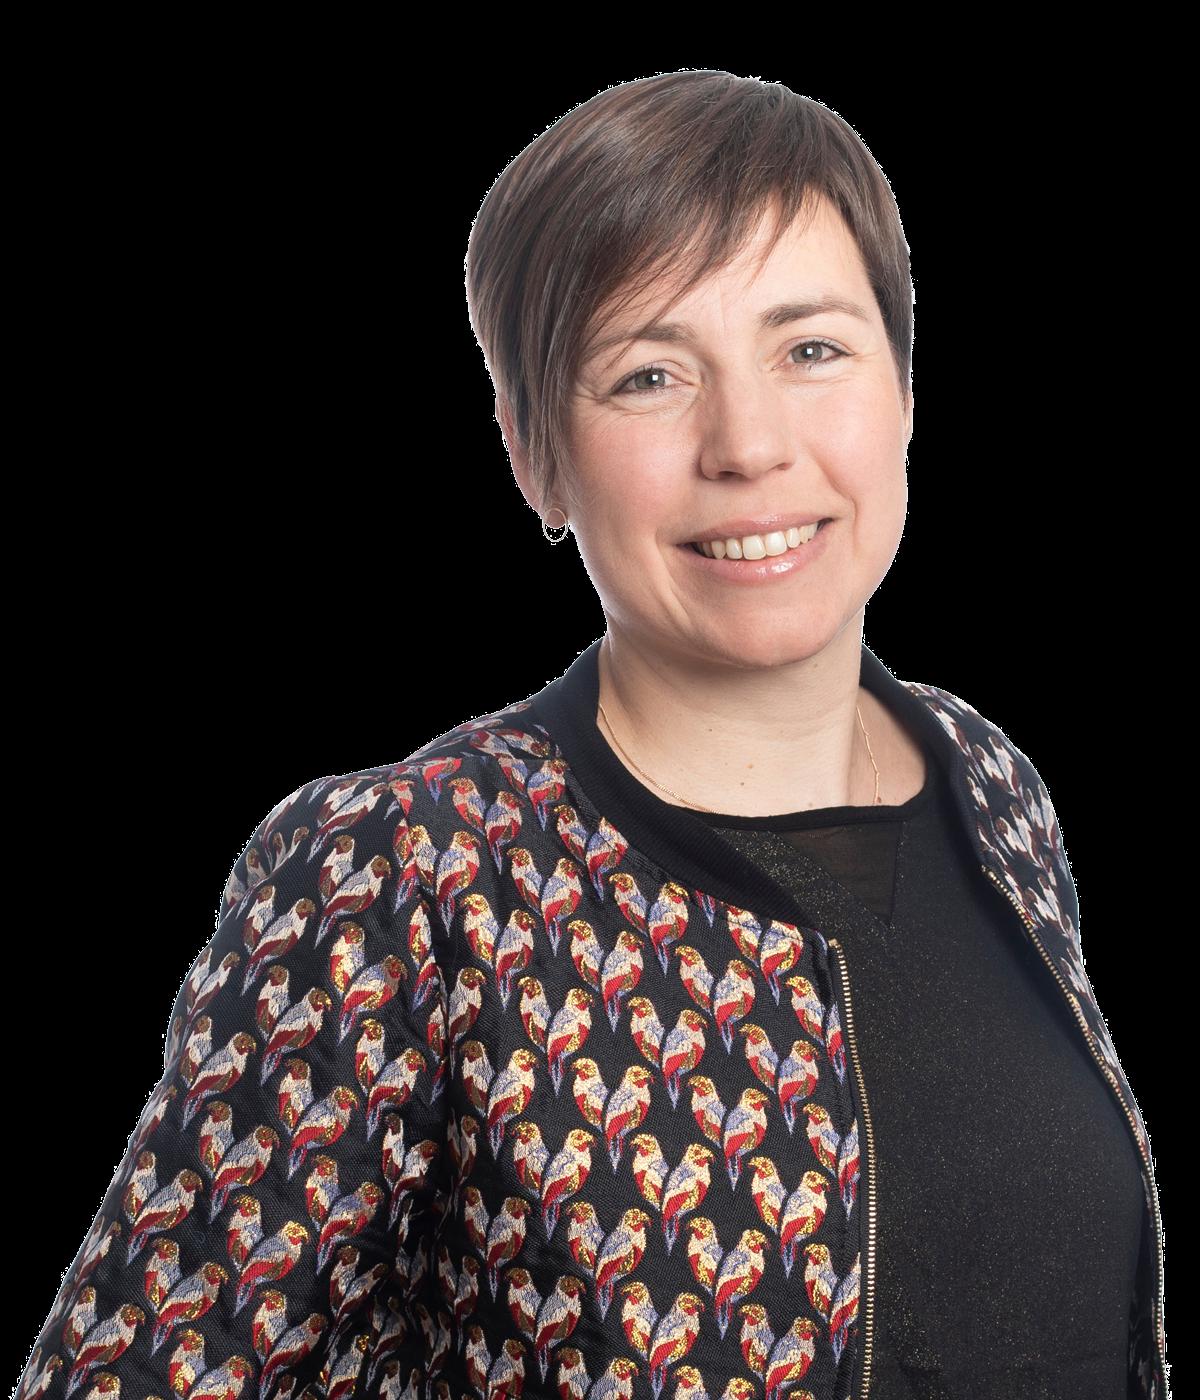 Katrien Timmermans